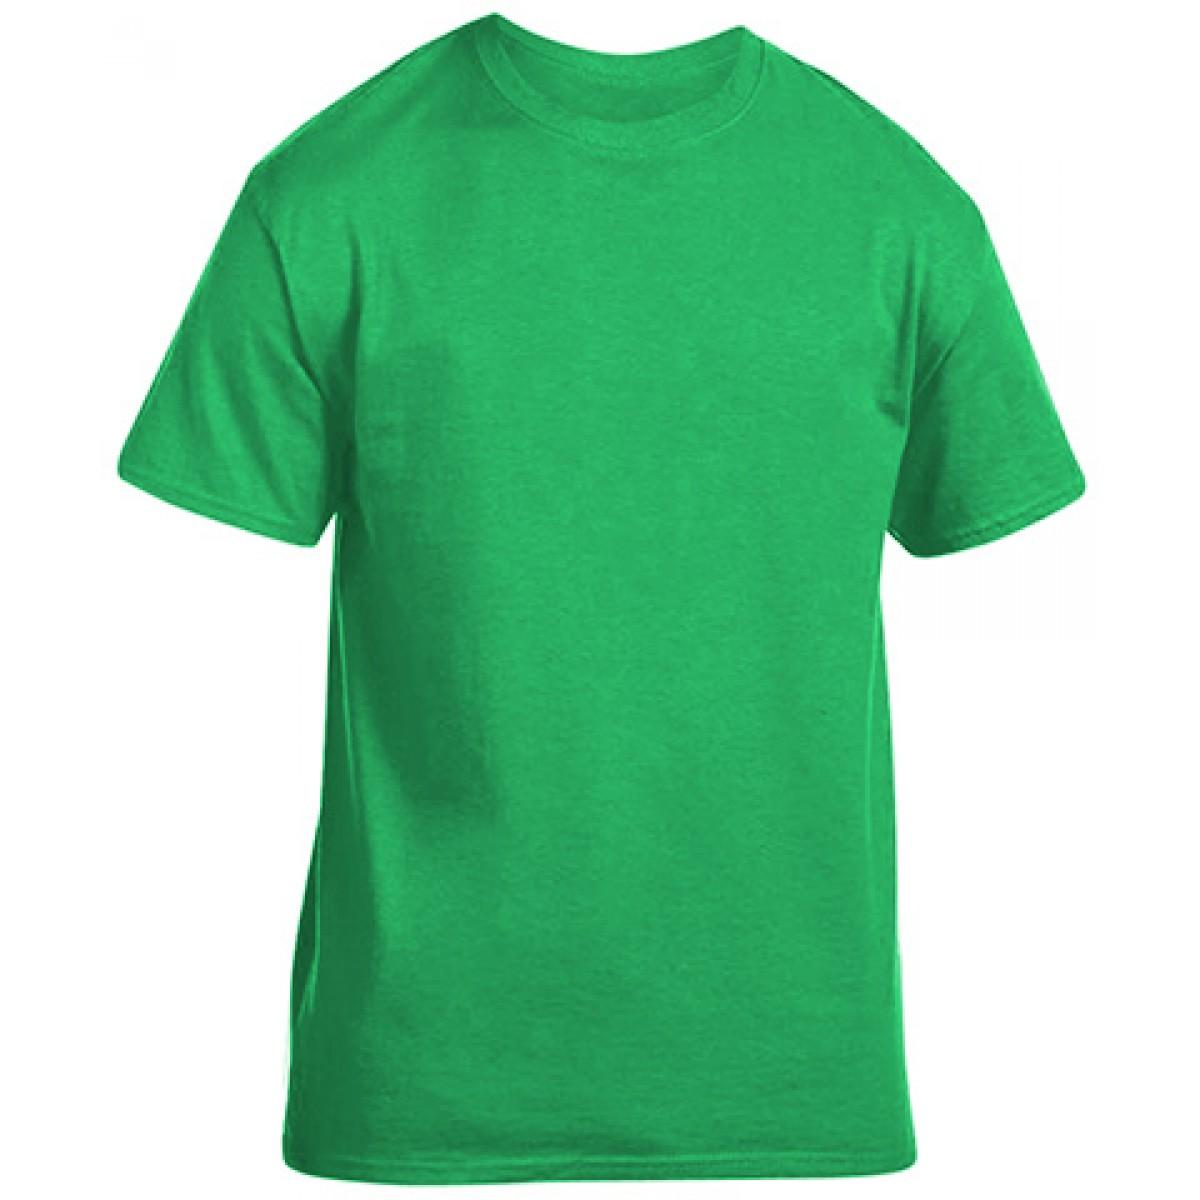 Soft 100% Cotton T-Shirt-Electric Green -L